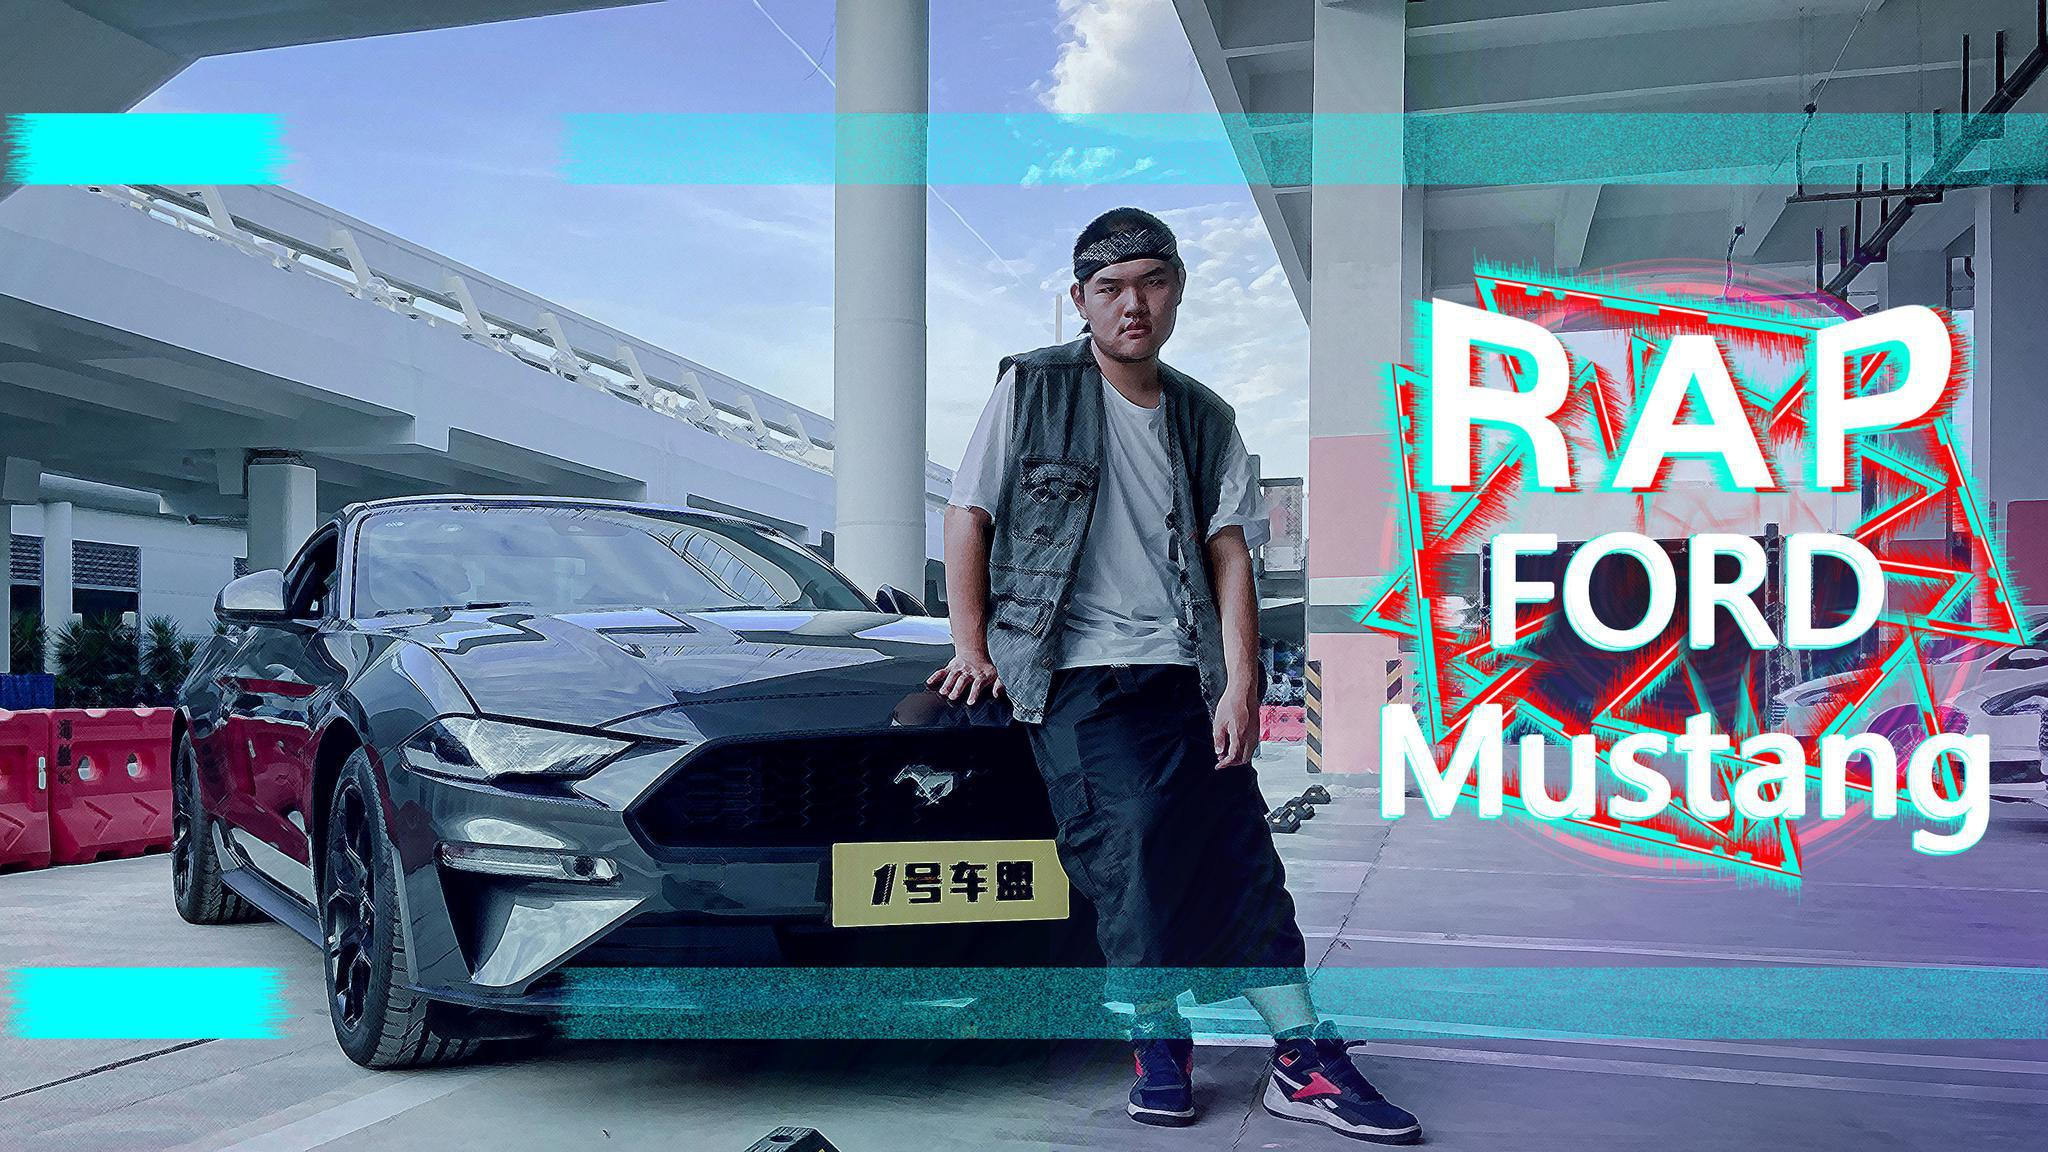 Rap | 福特Mustang:追逐子弹划过空气的感觉